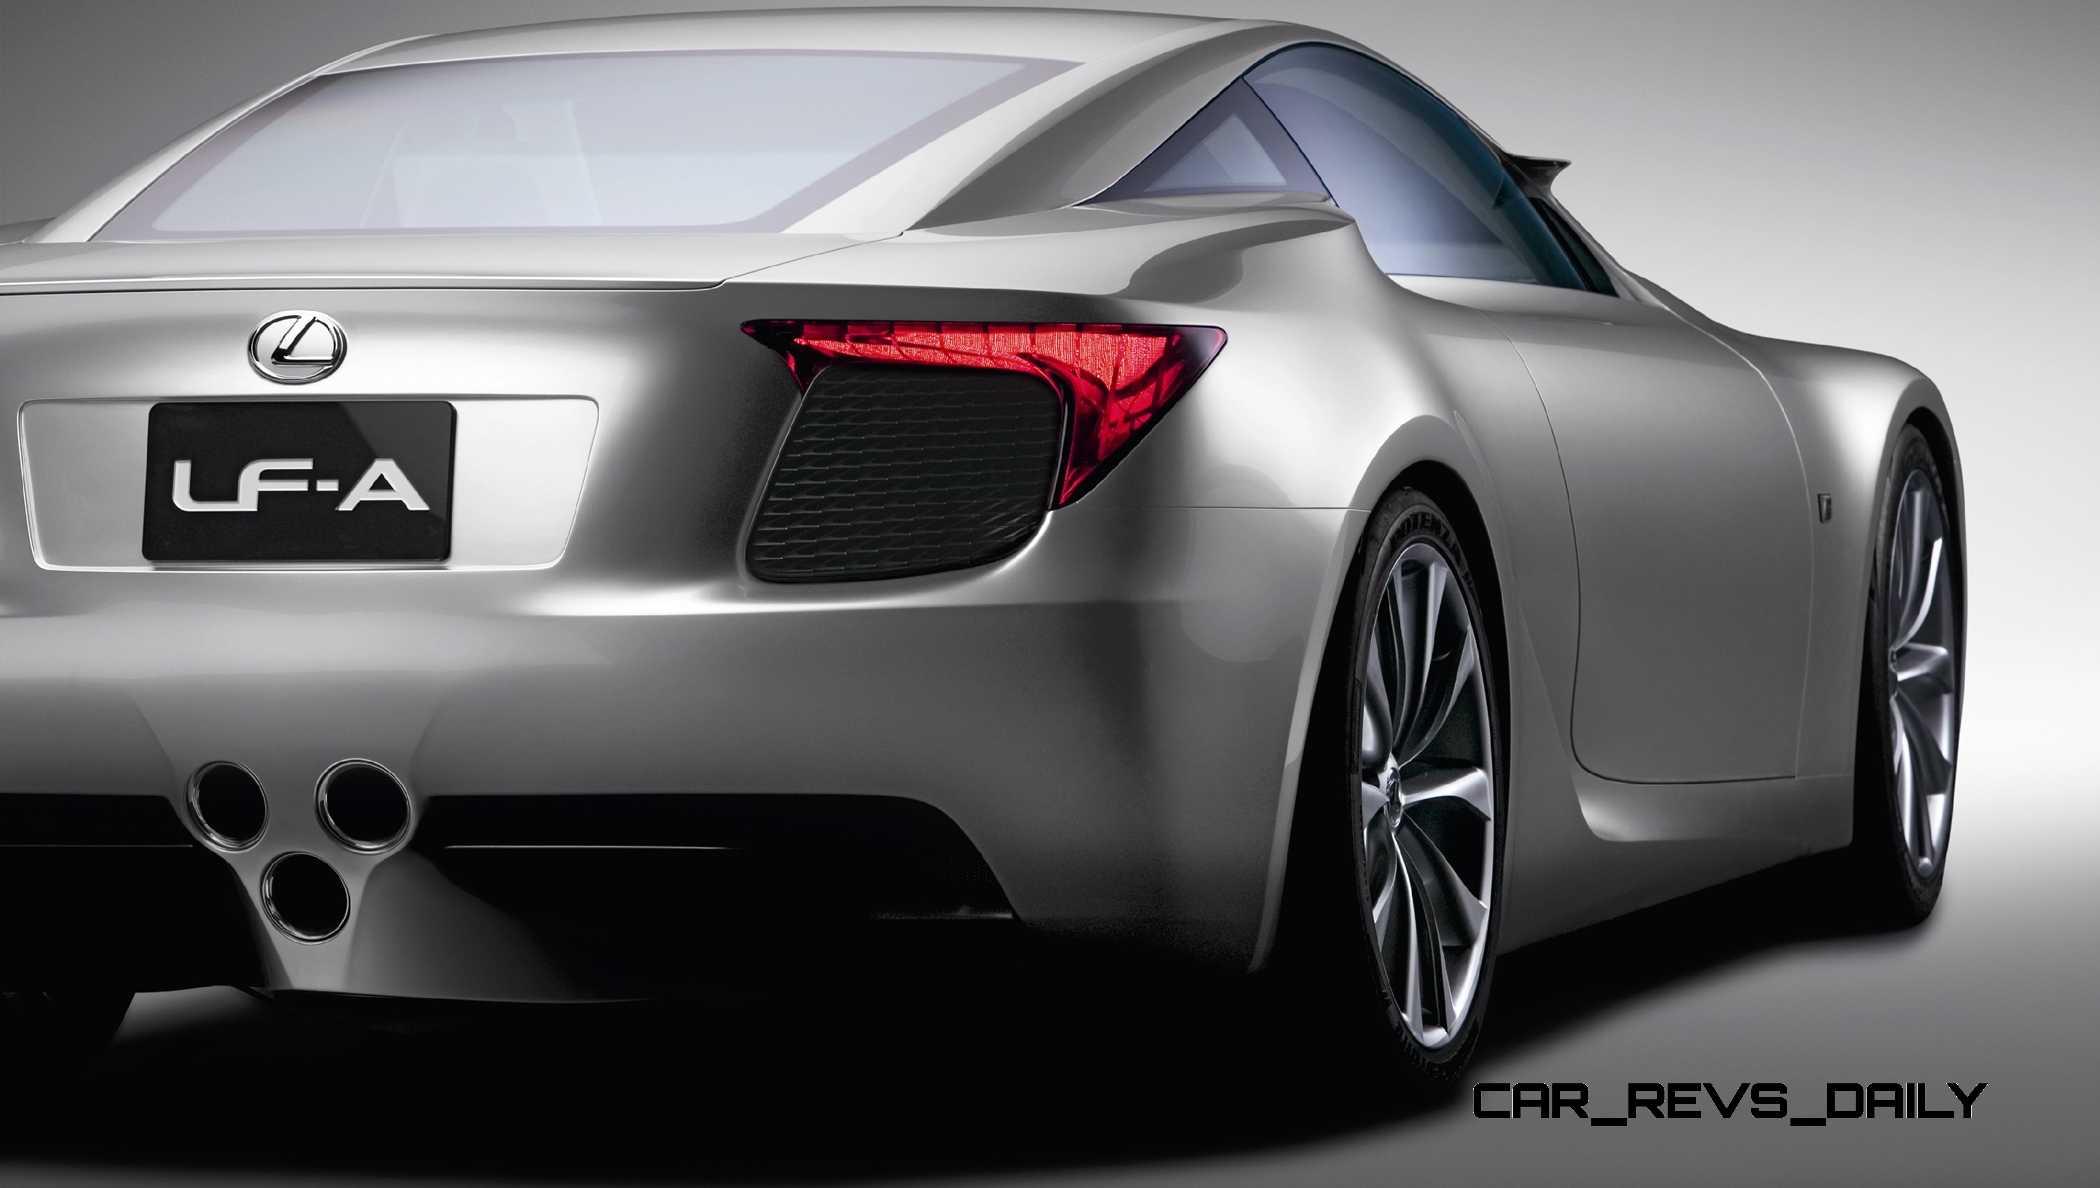 http://www.car-revs-daily.com/wp-content/uploads/2014/10/2005-Lexus-LFA-Coupe-29.jpg